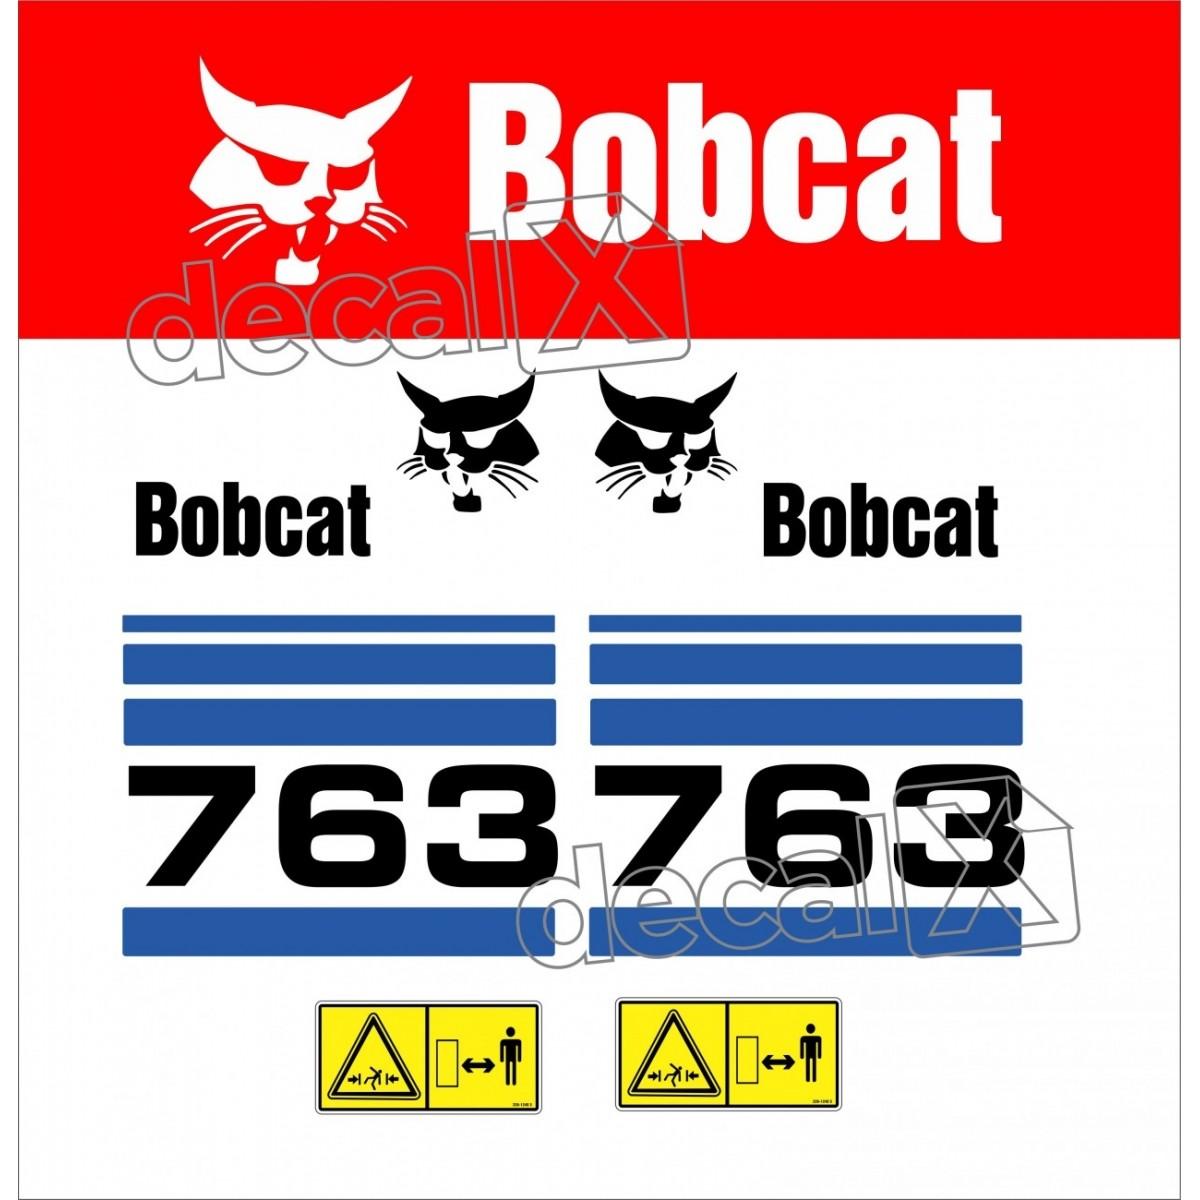 Kit Adesivos Bobcat 763 Decalx